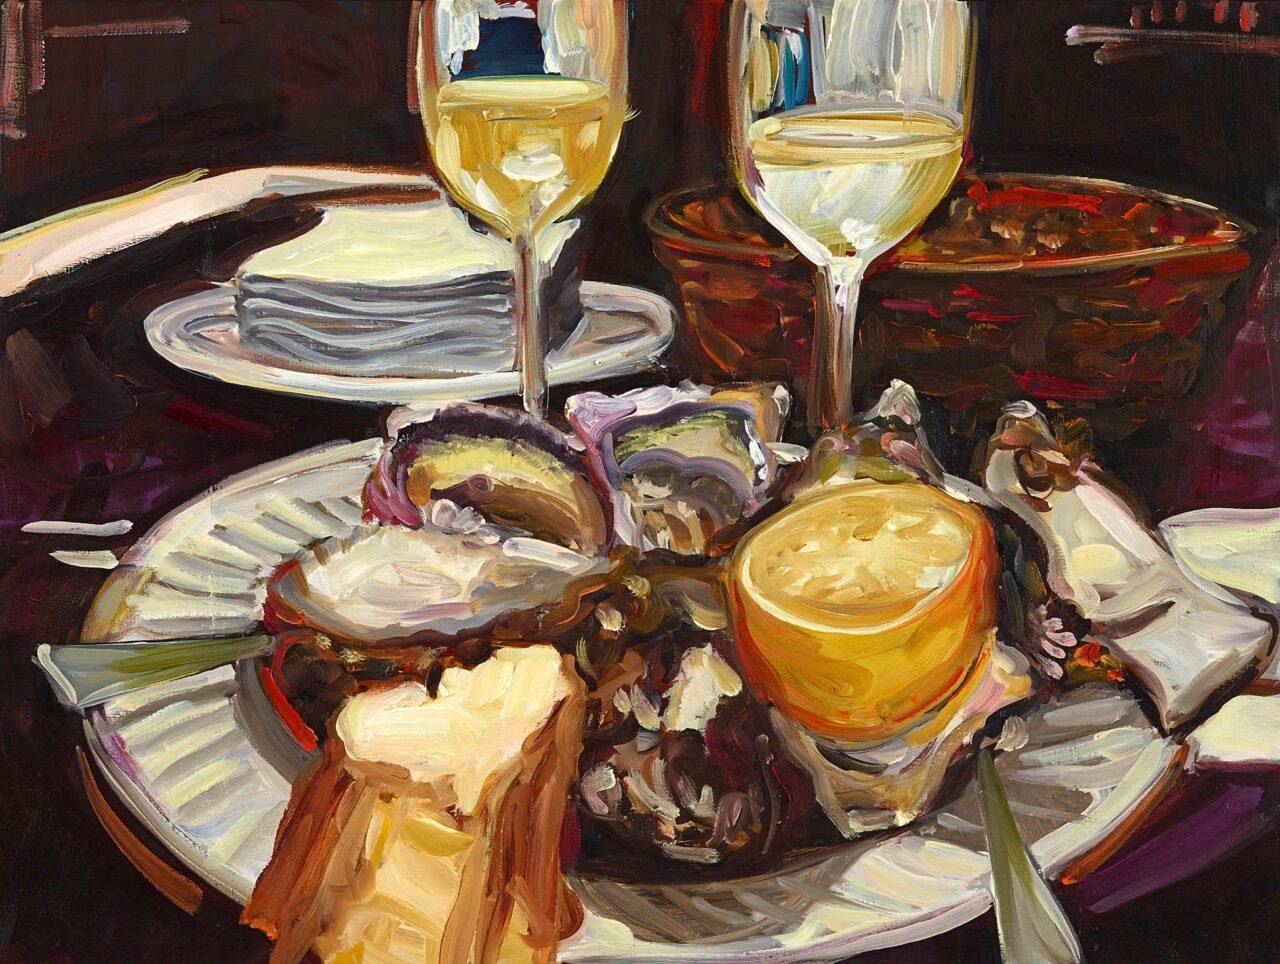 La vie est belle! Paris Bar, Sylter Royal | Caroline Weihrauch | available artwork